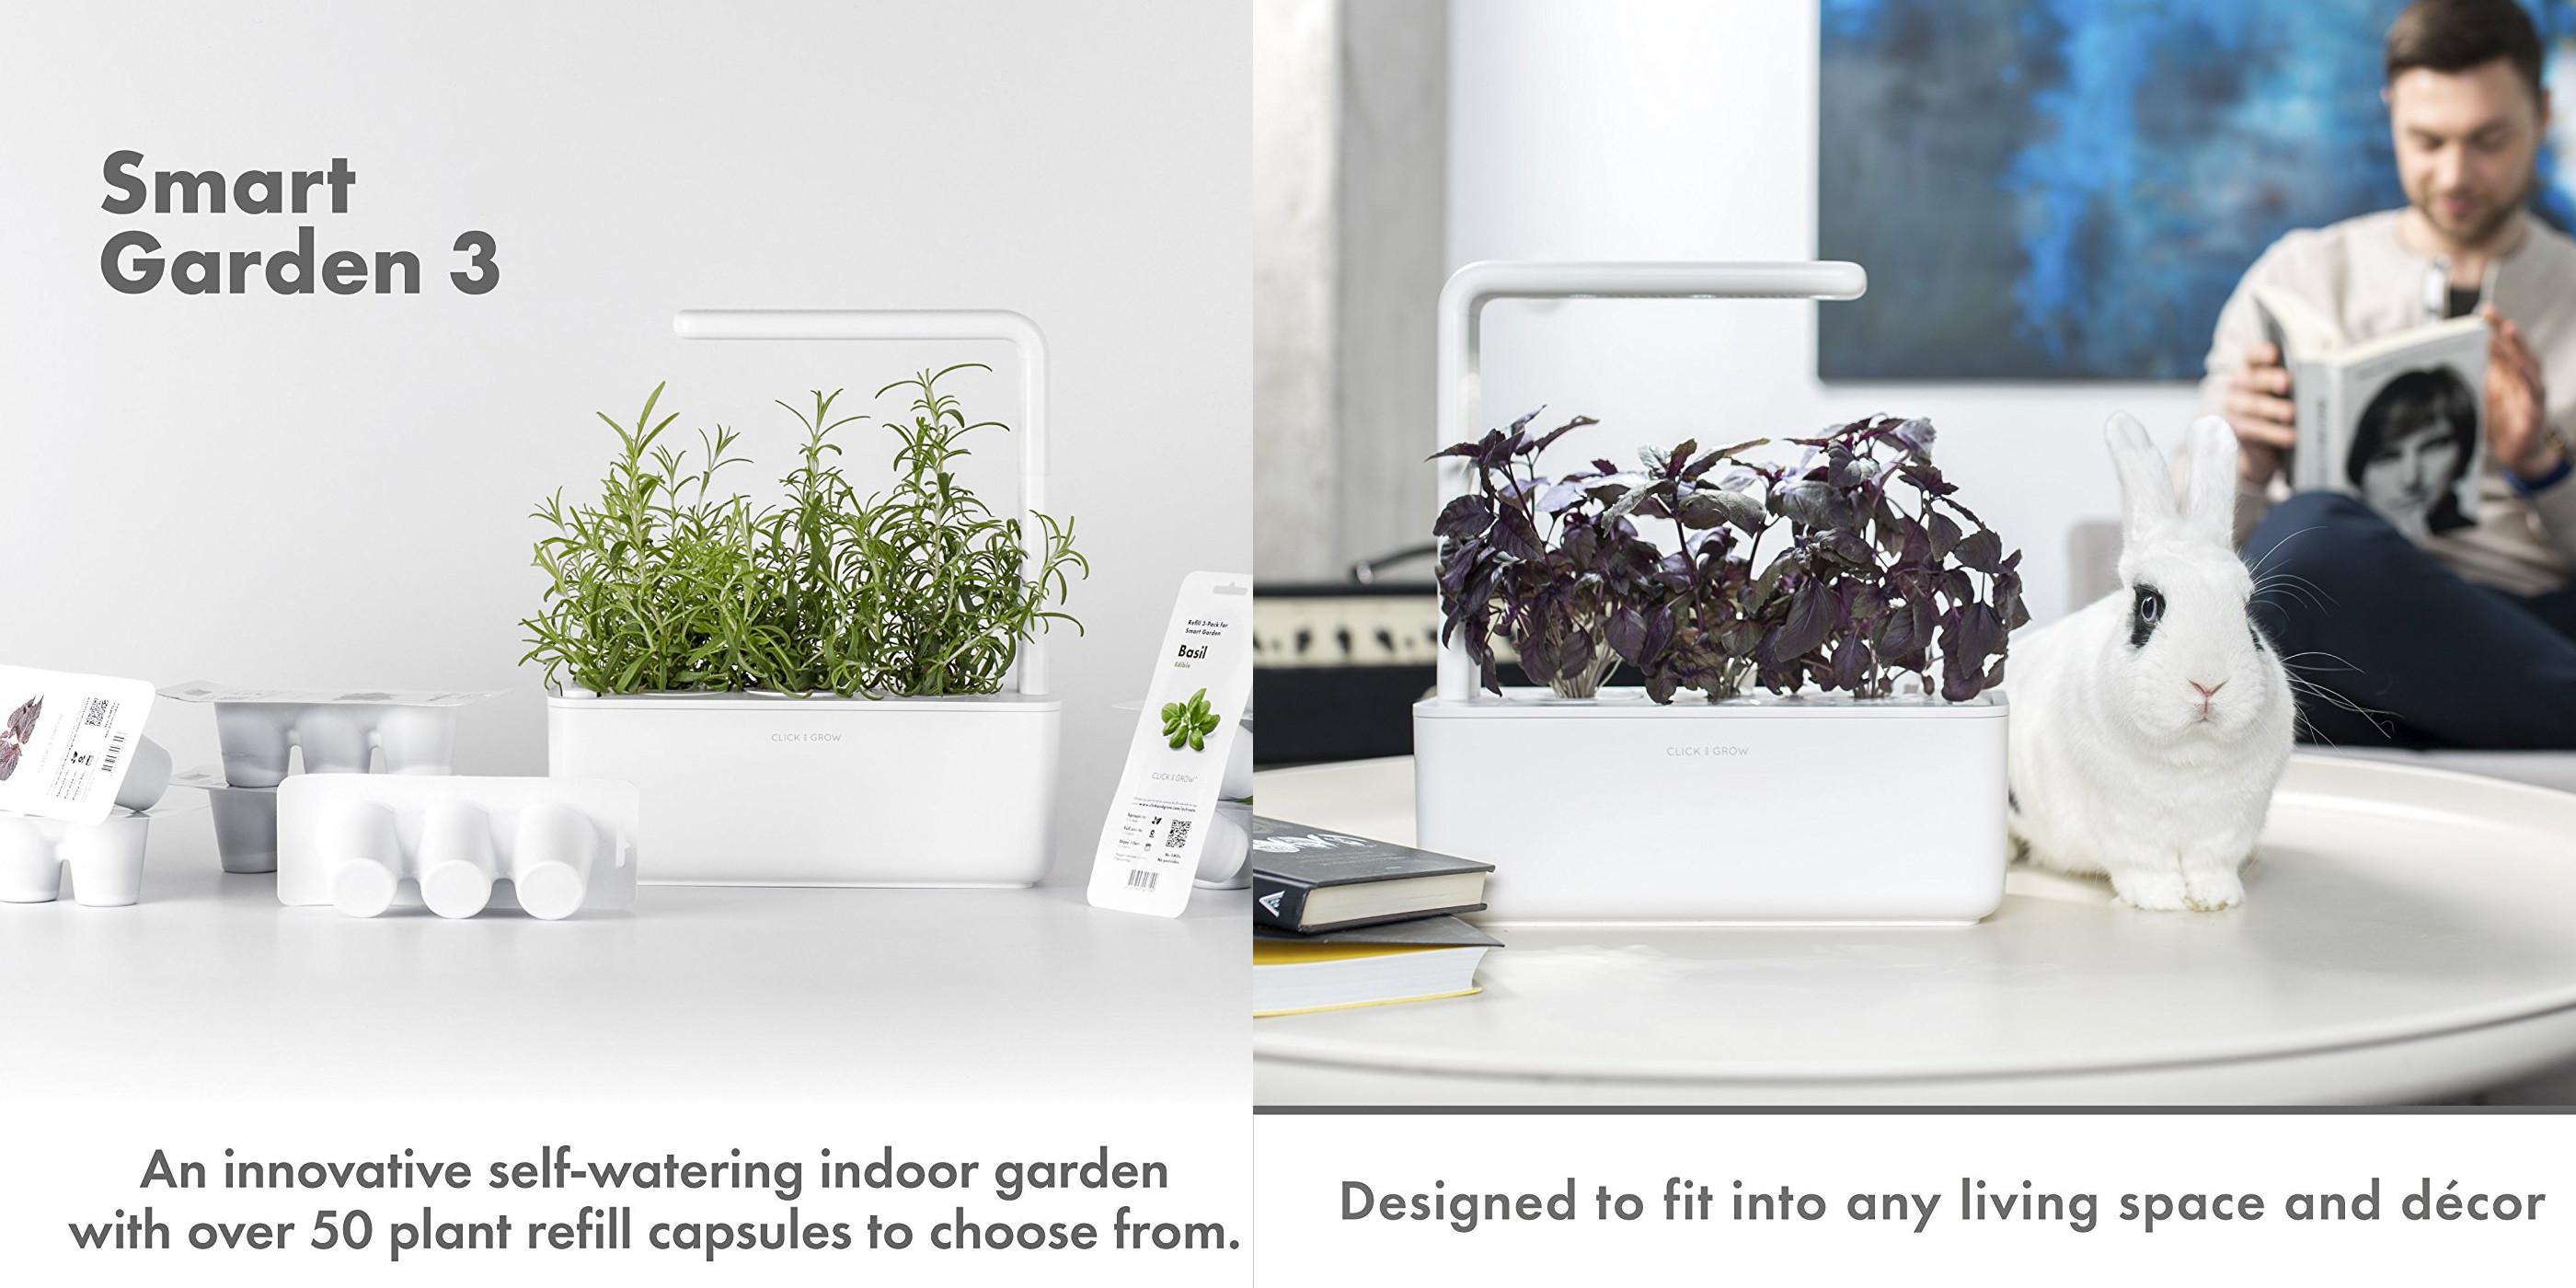 Smart Garden 3 Indoor Gardening Kits 25 Off For Valentineu0027s Day  Free Shipping